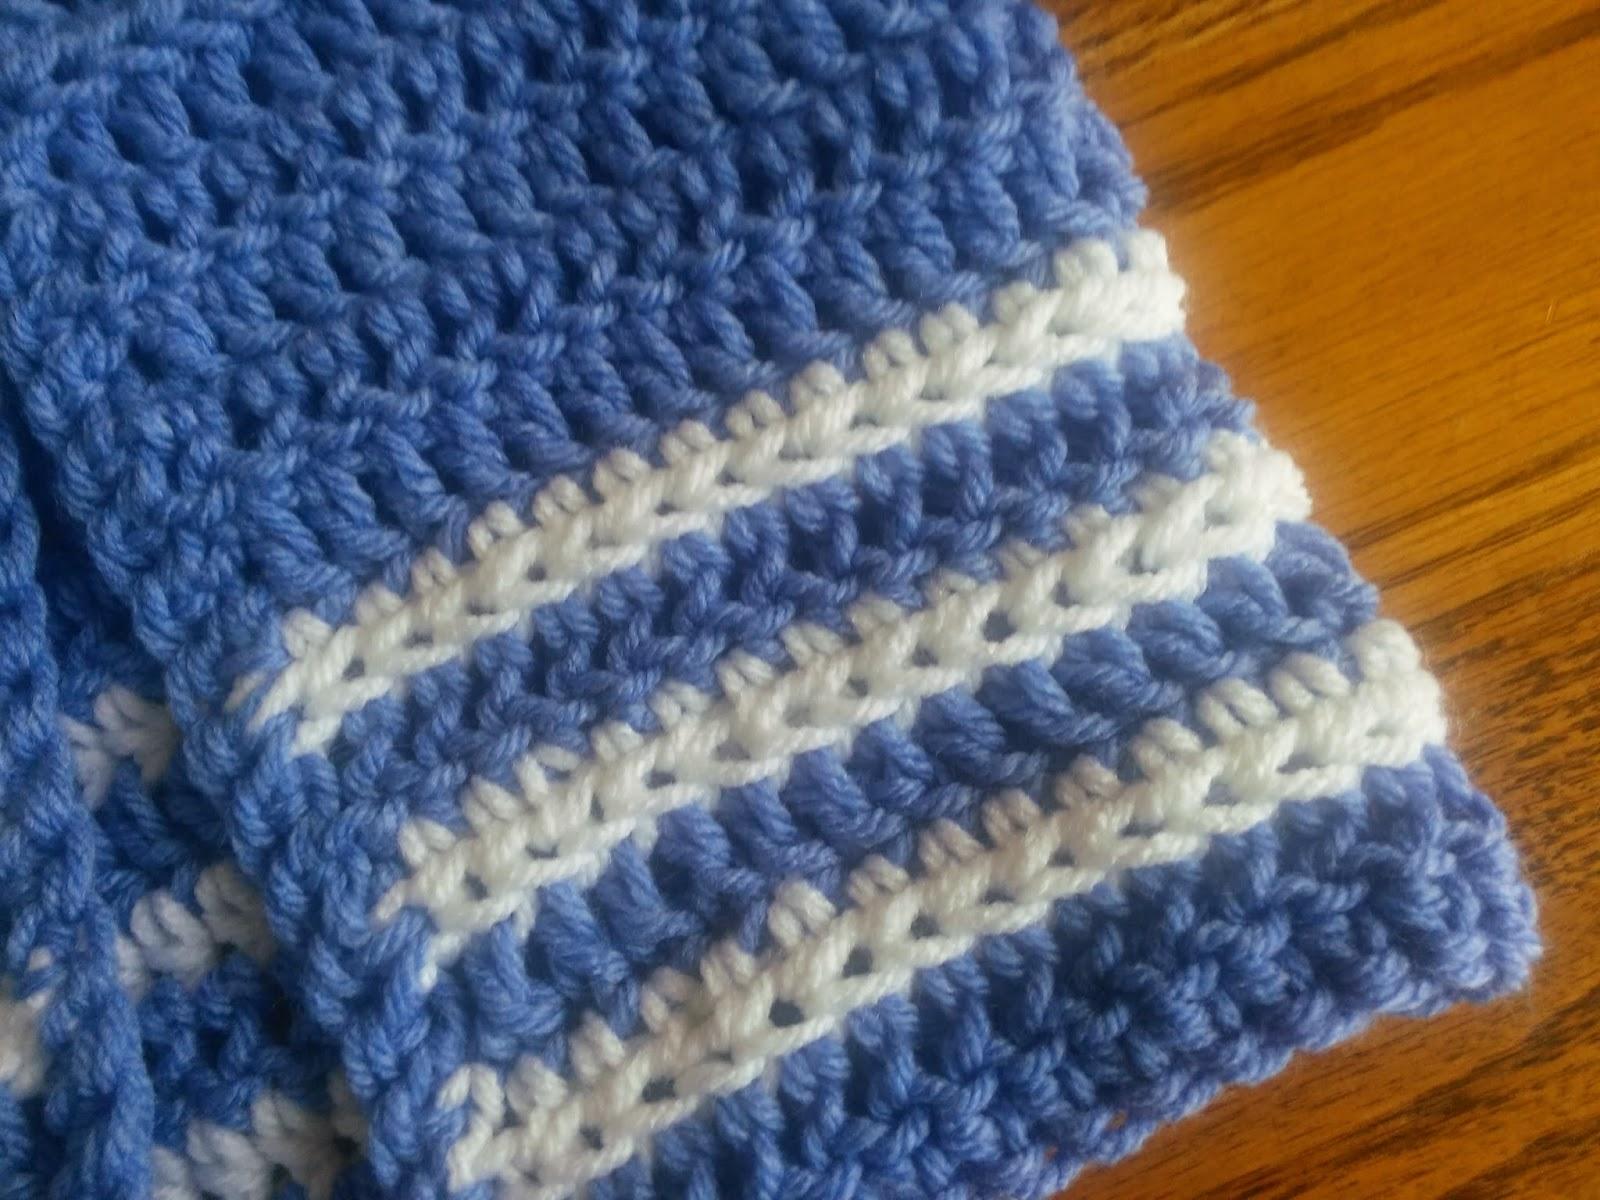 Crochet Patterns For Toddler Boy : Craft Brag: Baby Boy Crochet Sweater - Pattern